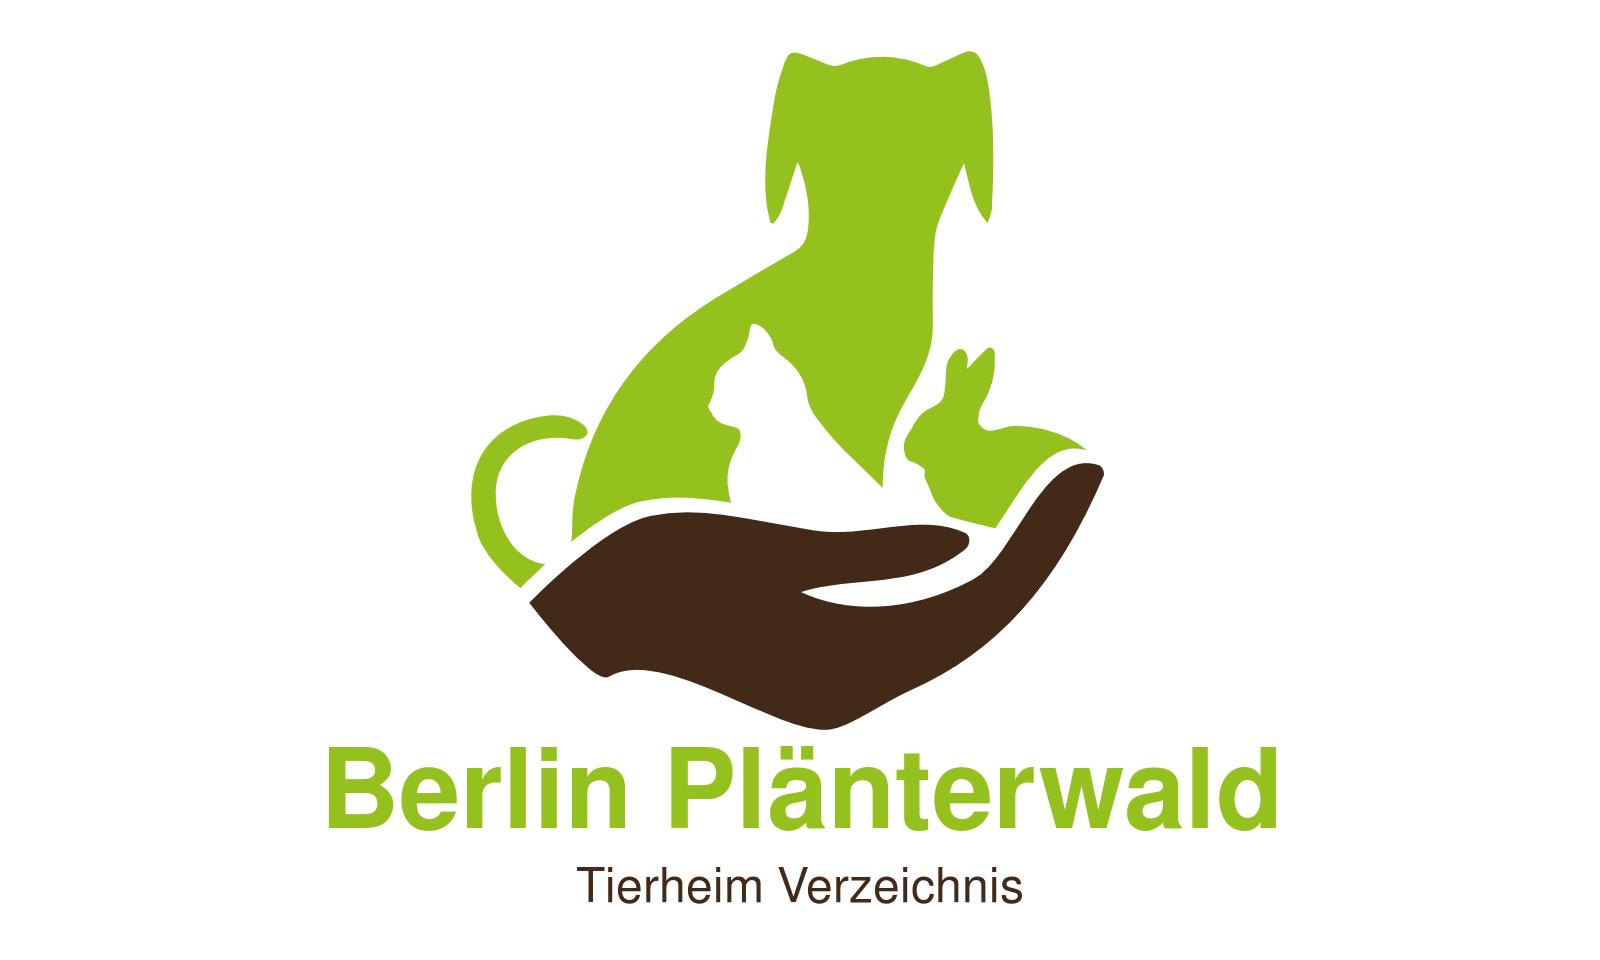 Tierheim Berlin Plänterwald